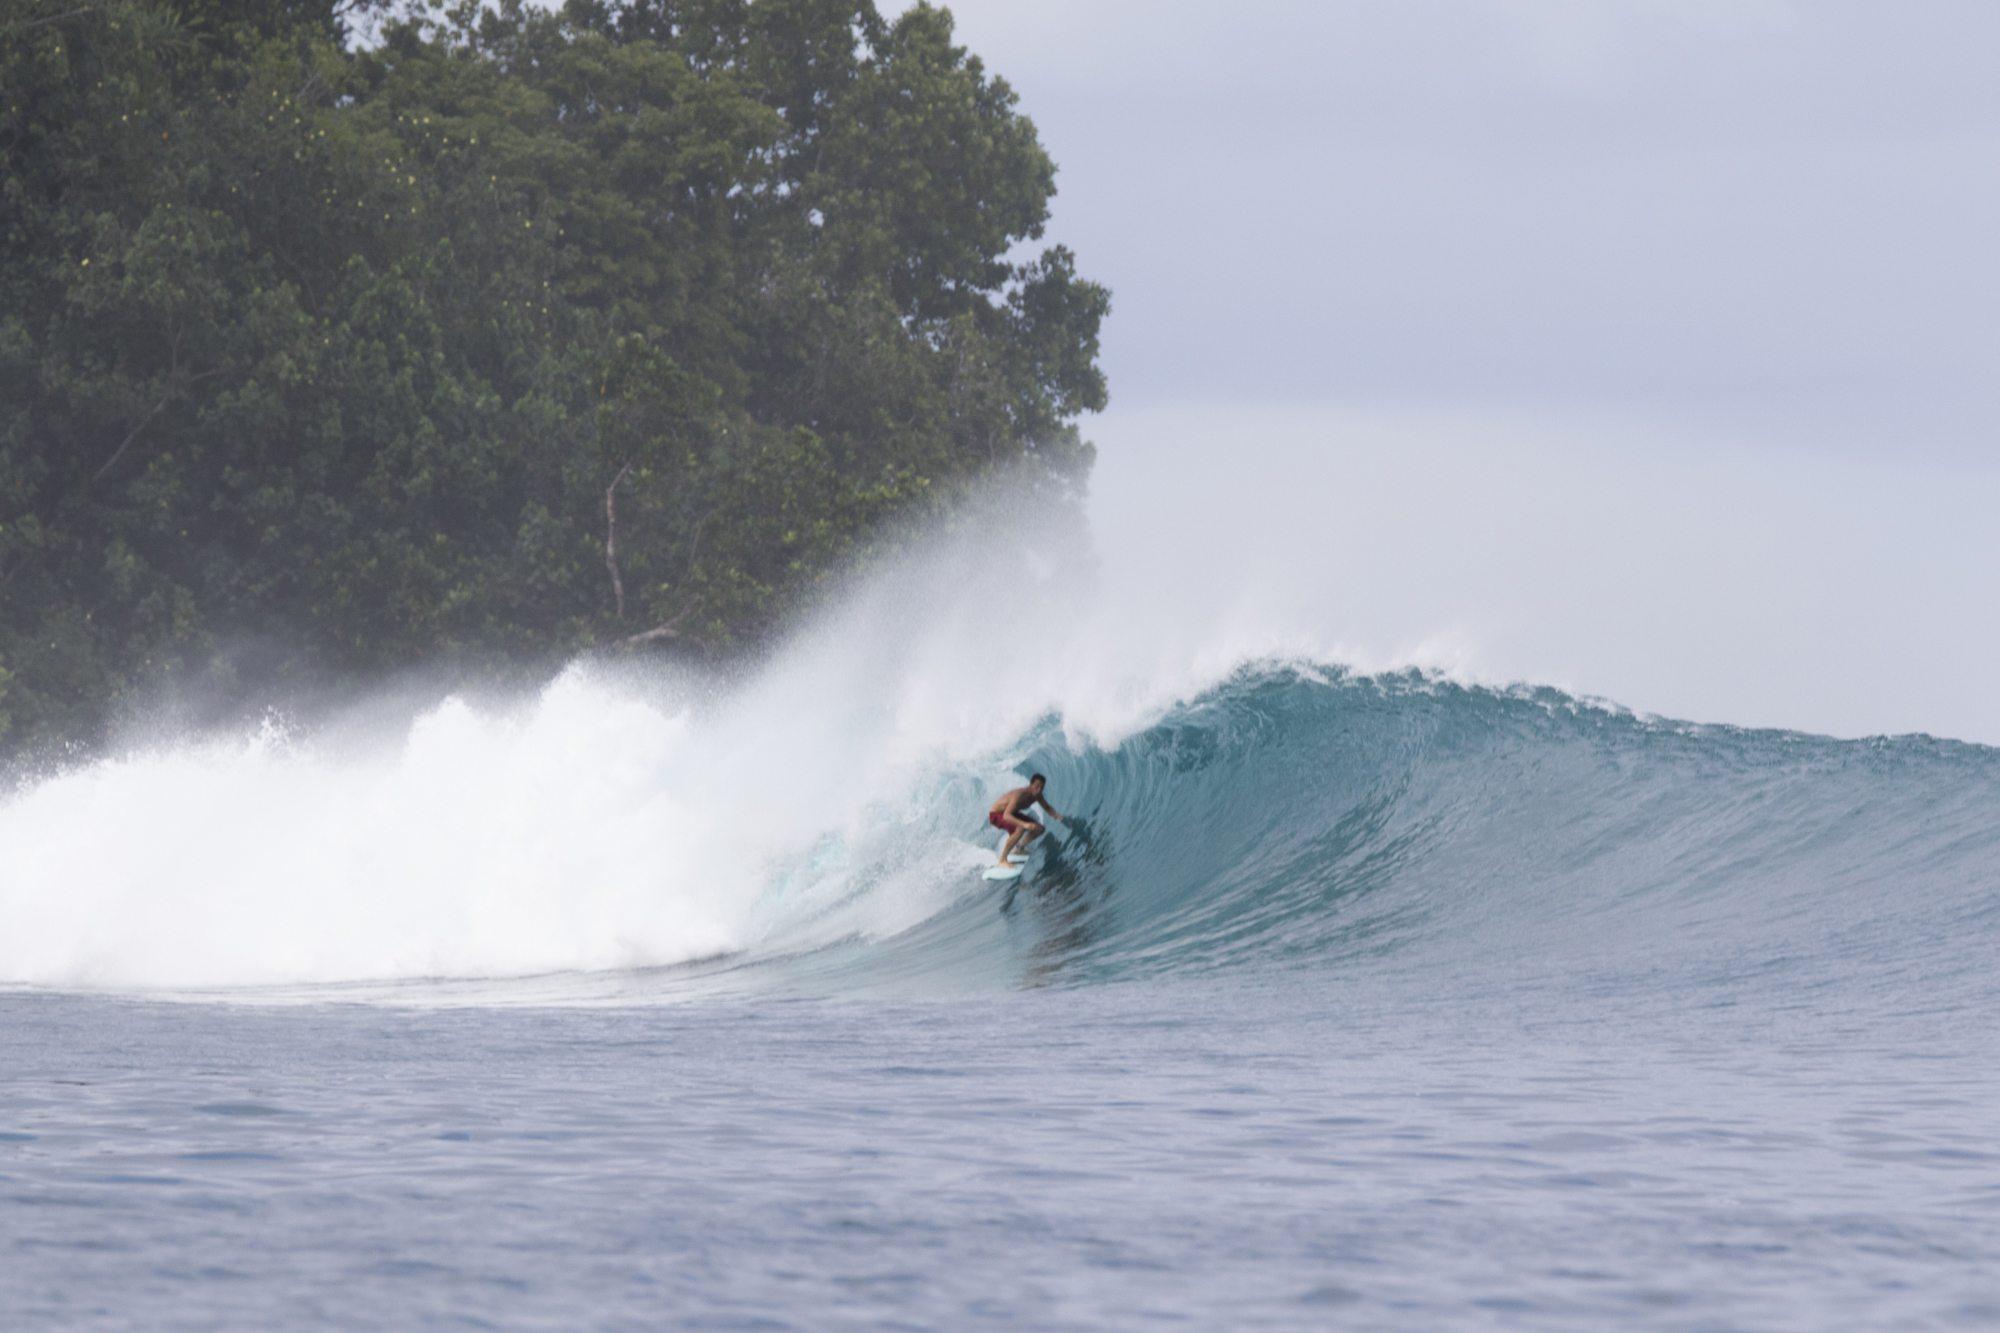 Clarets / Lolok Point / Bay of Plenty Lefts 16